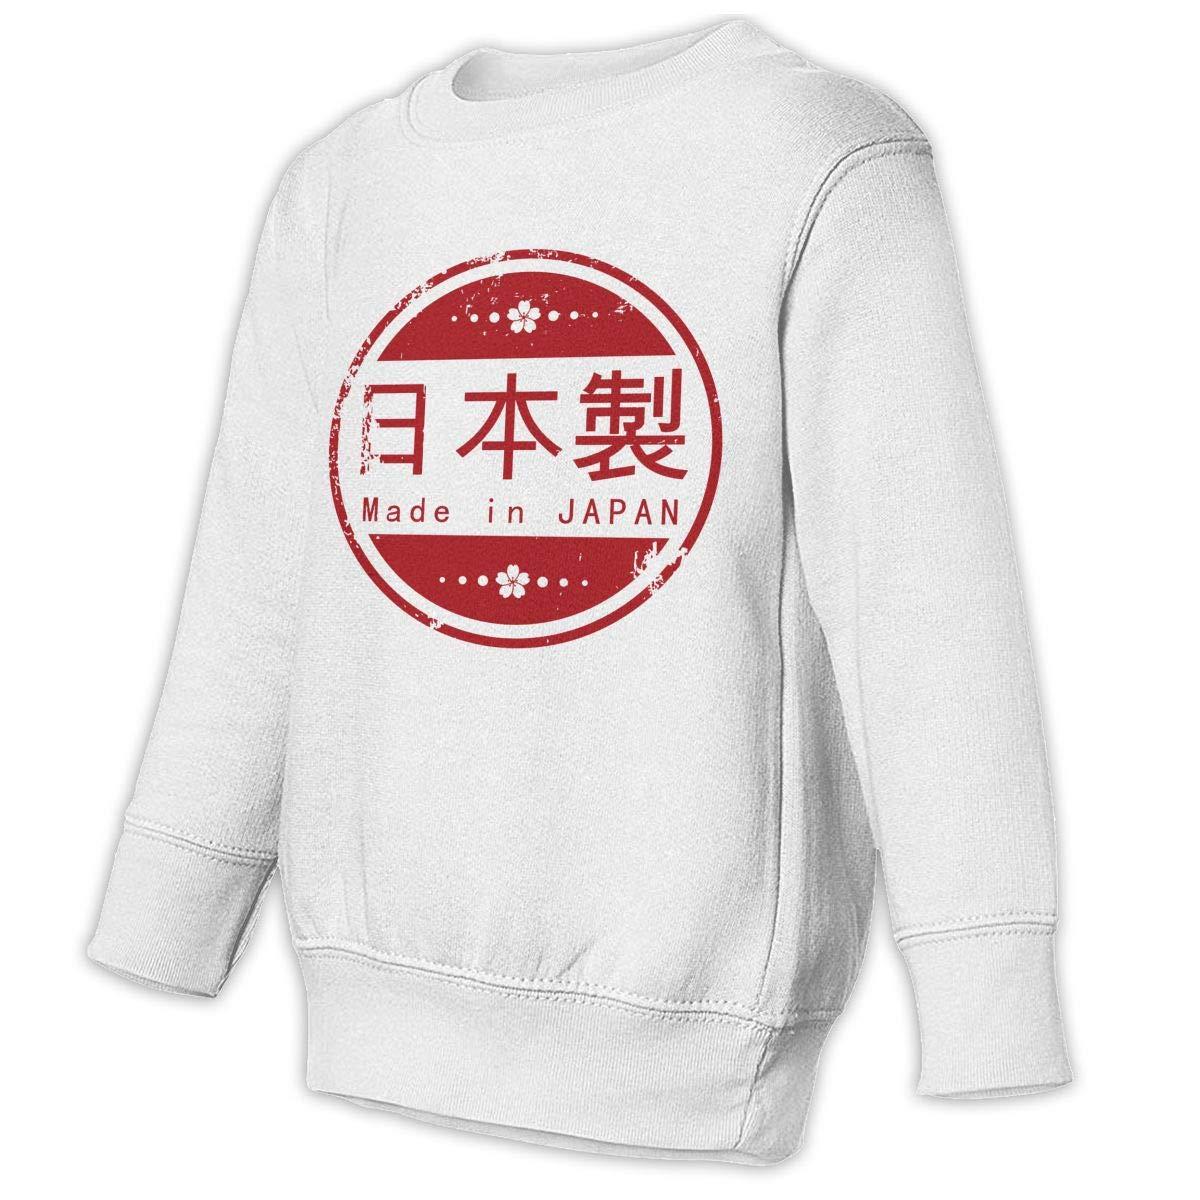 Made in Japan Baby Sweatshirt Adorable Kids Hoodies Comfortable Pullovers